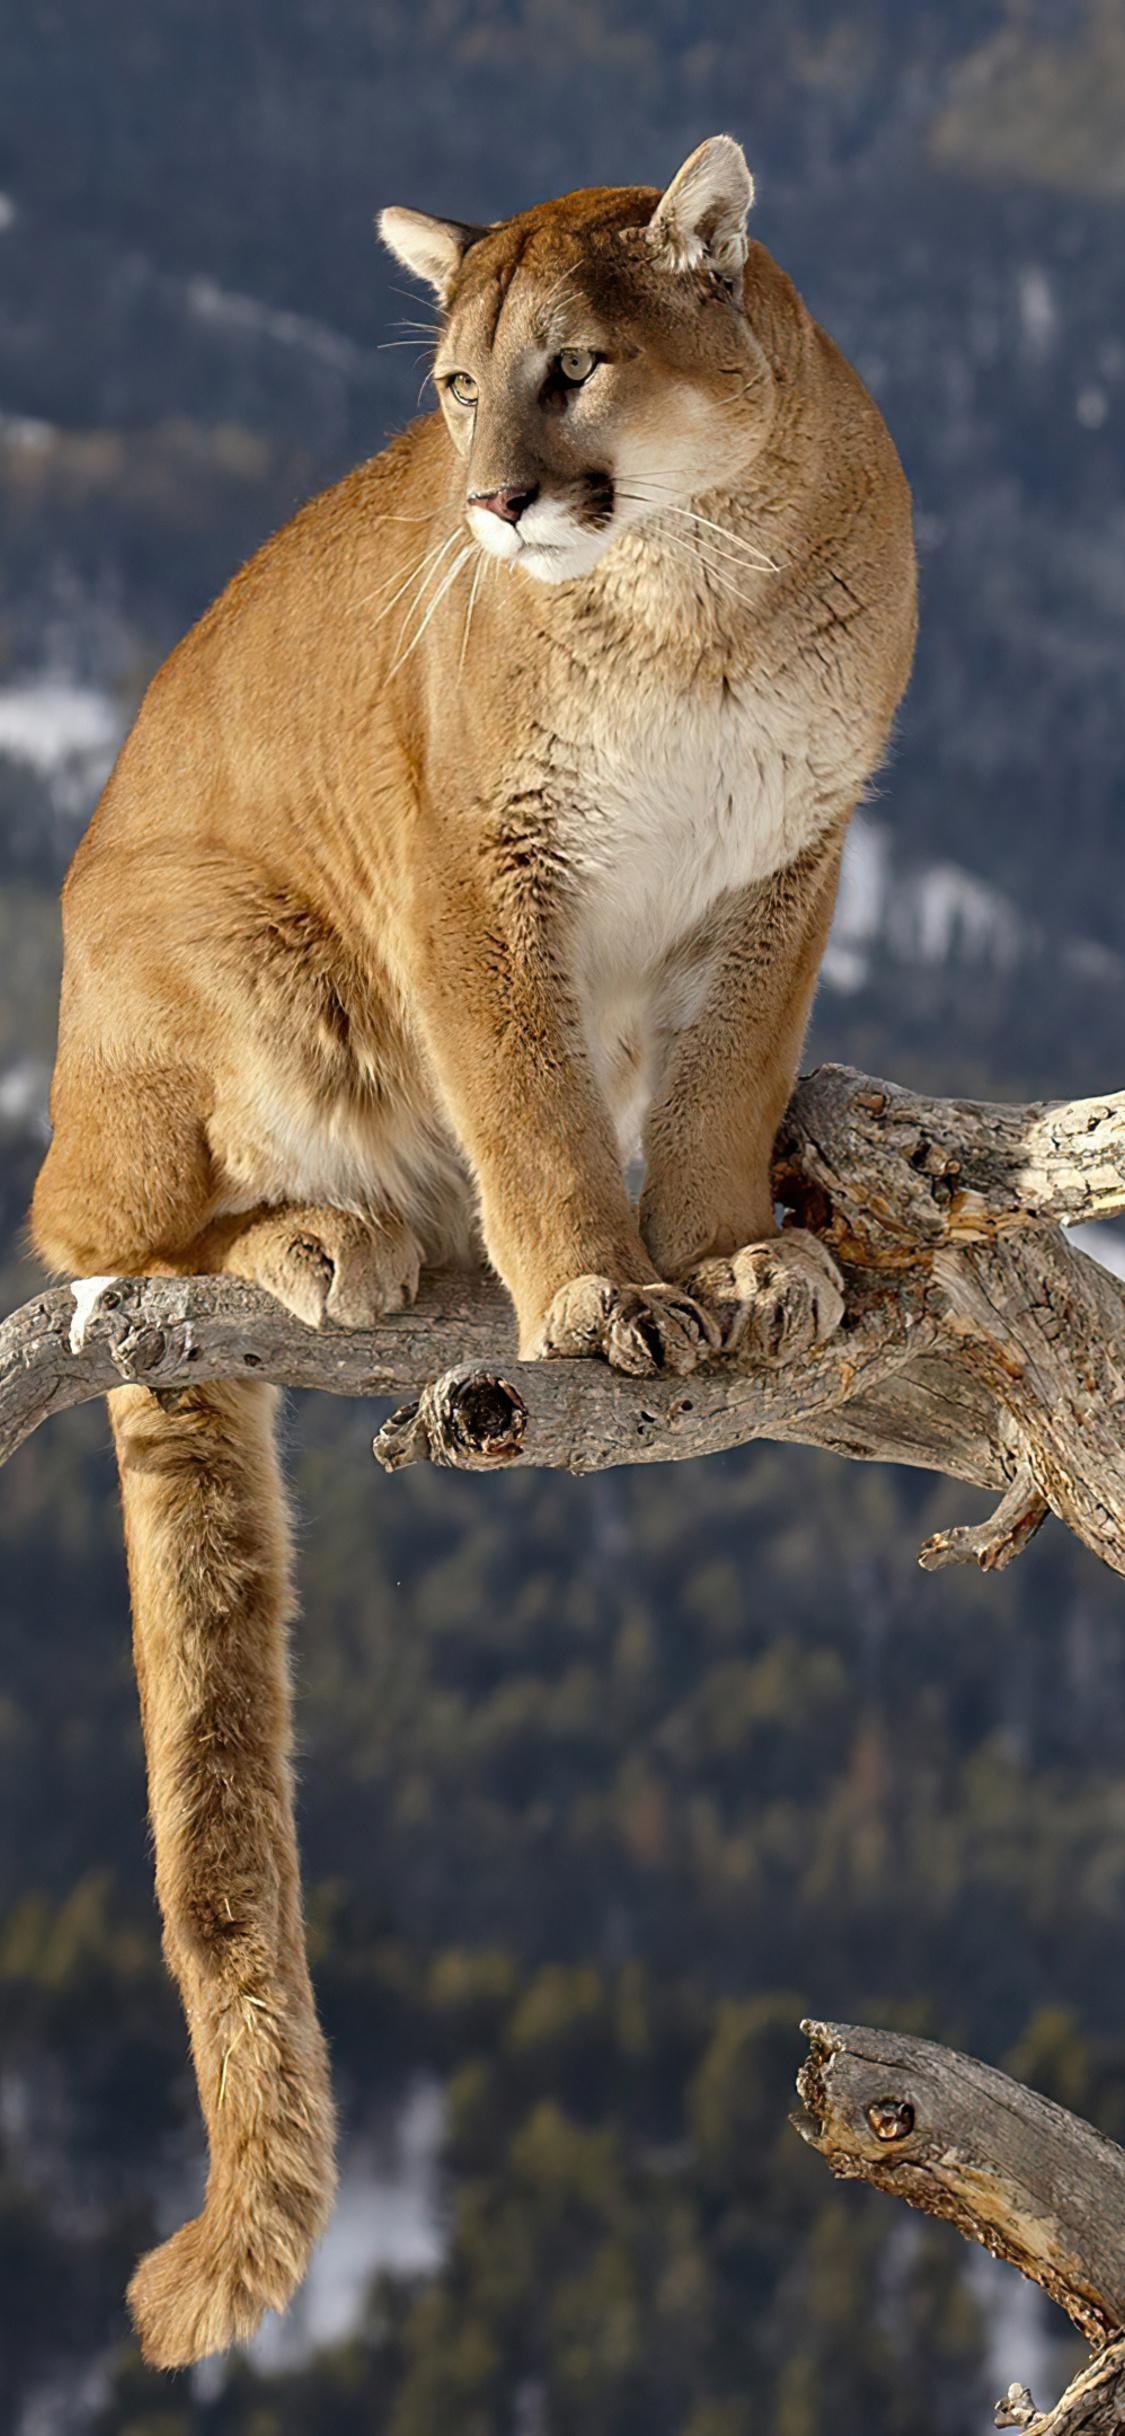 cougar-on-a-branch-4k-ie.jpg